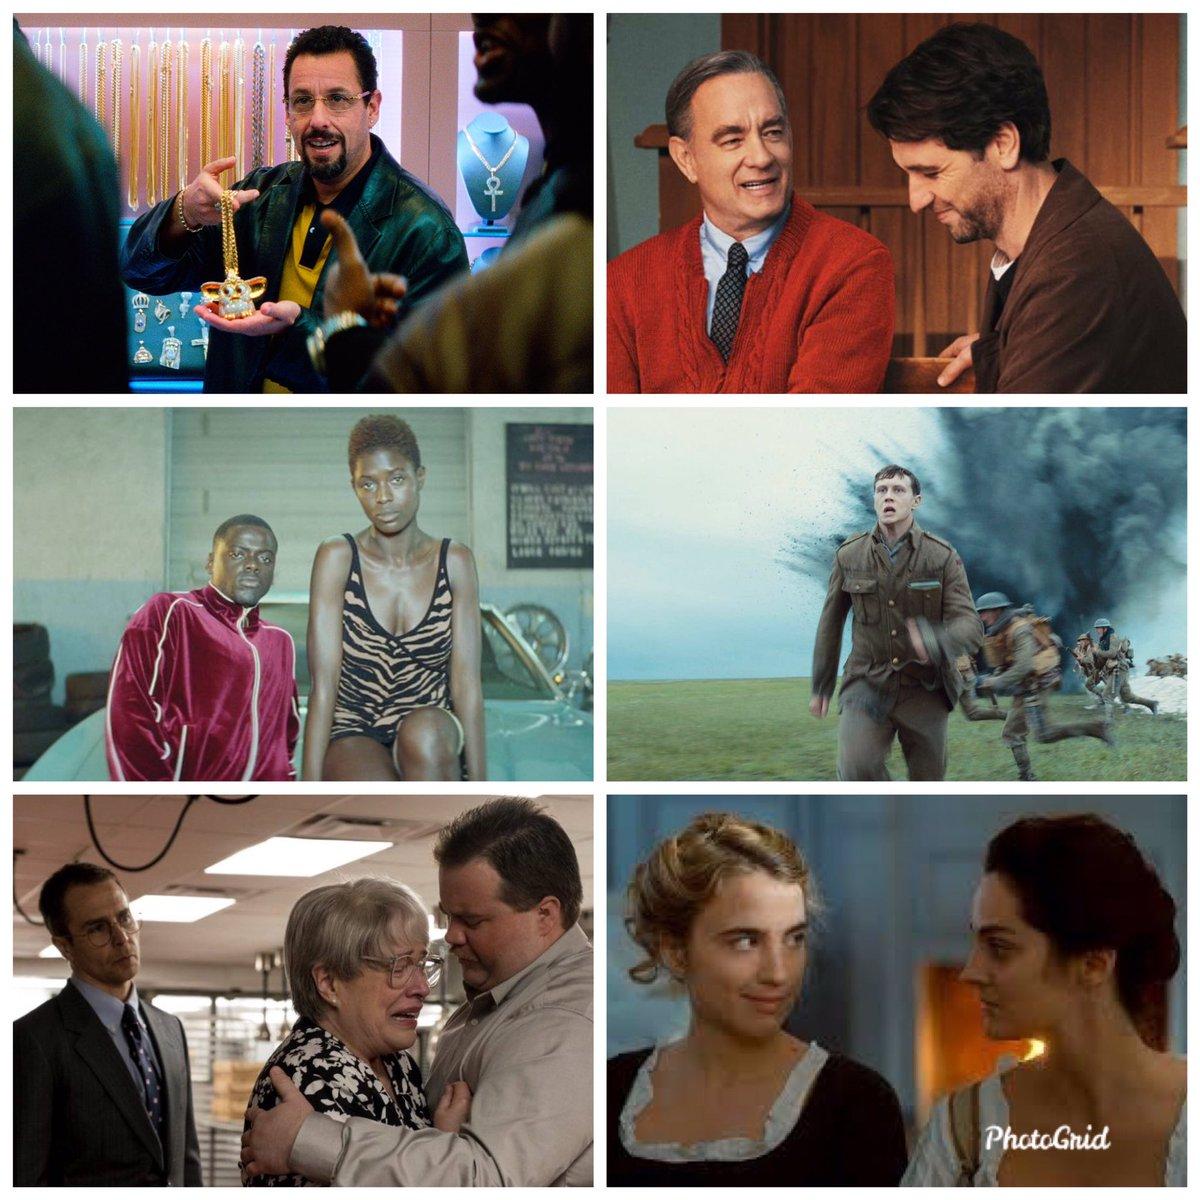 #AwardsSeason está ya finalizando, pues me eché seis películas mas: 1. #UncutGems 10 2. #ABeautifulDayInTheNeighborhood 7 3. #QueenAndSlim 7 4.  #1917 9 5. #RichardJewell 7 6. #PortraitOfALadyOnFire 7.pic.twitter.com/wjrGWHyNNc